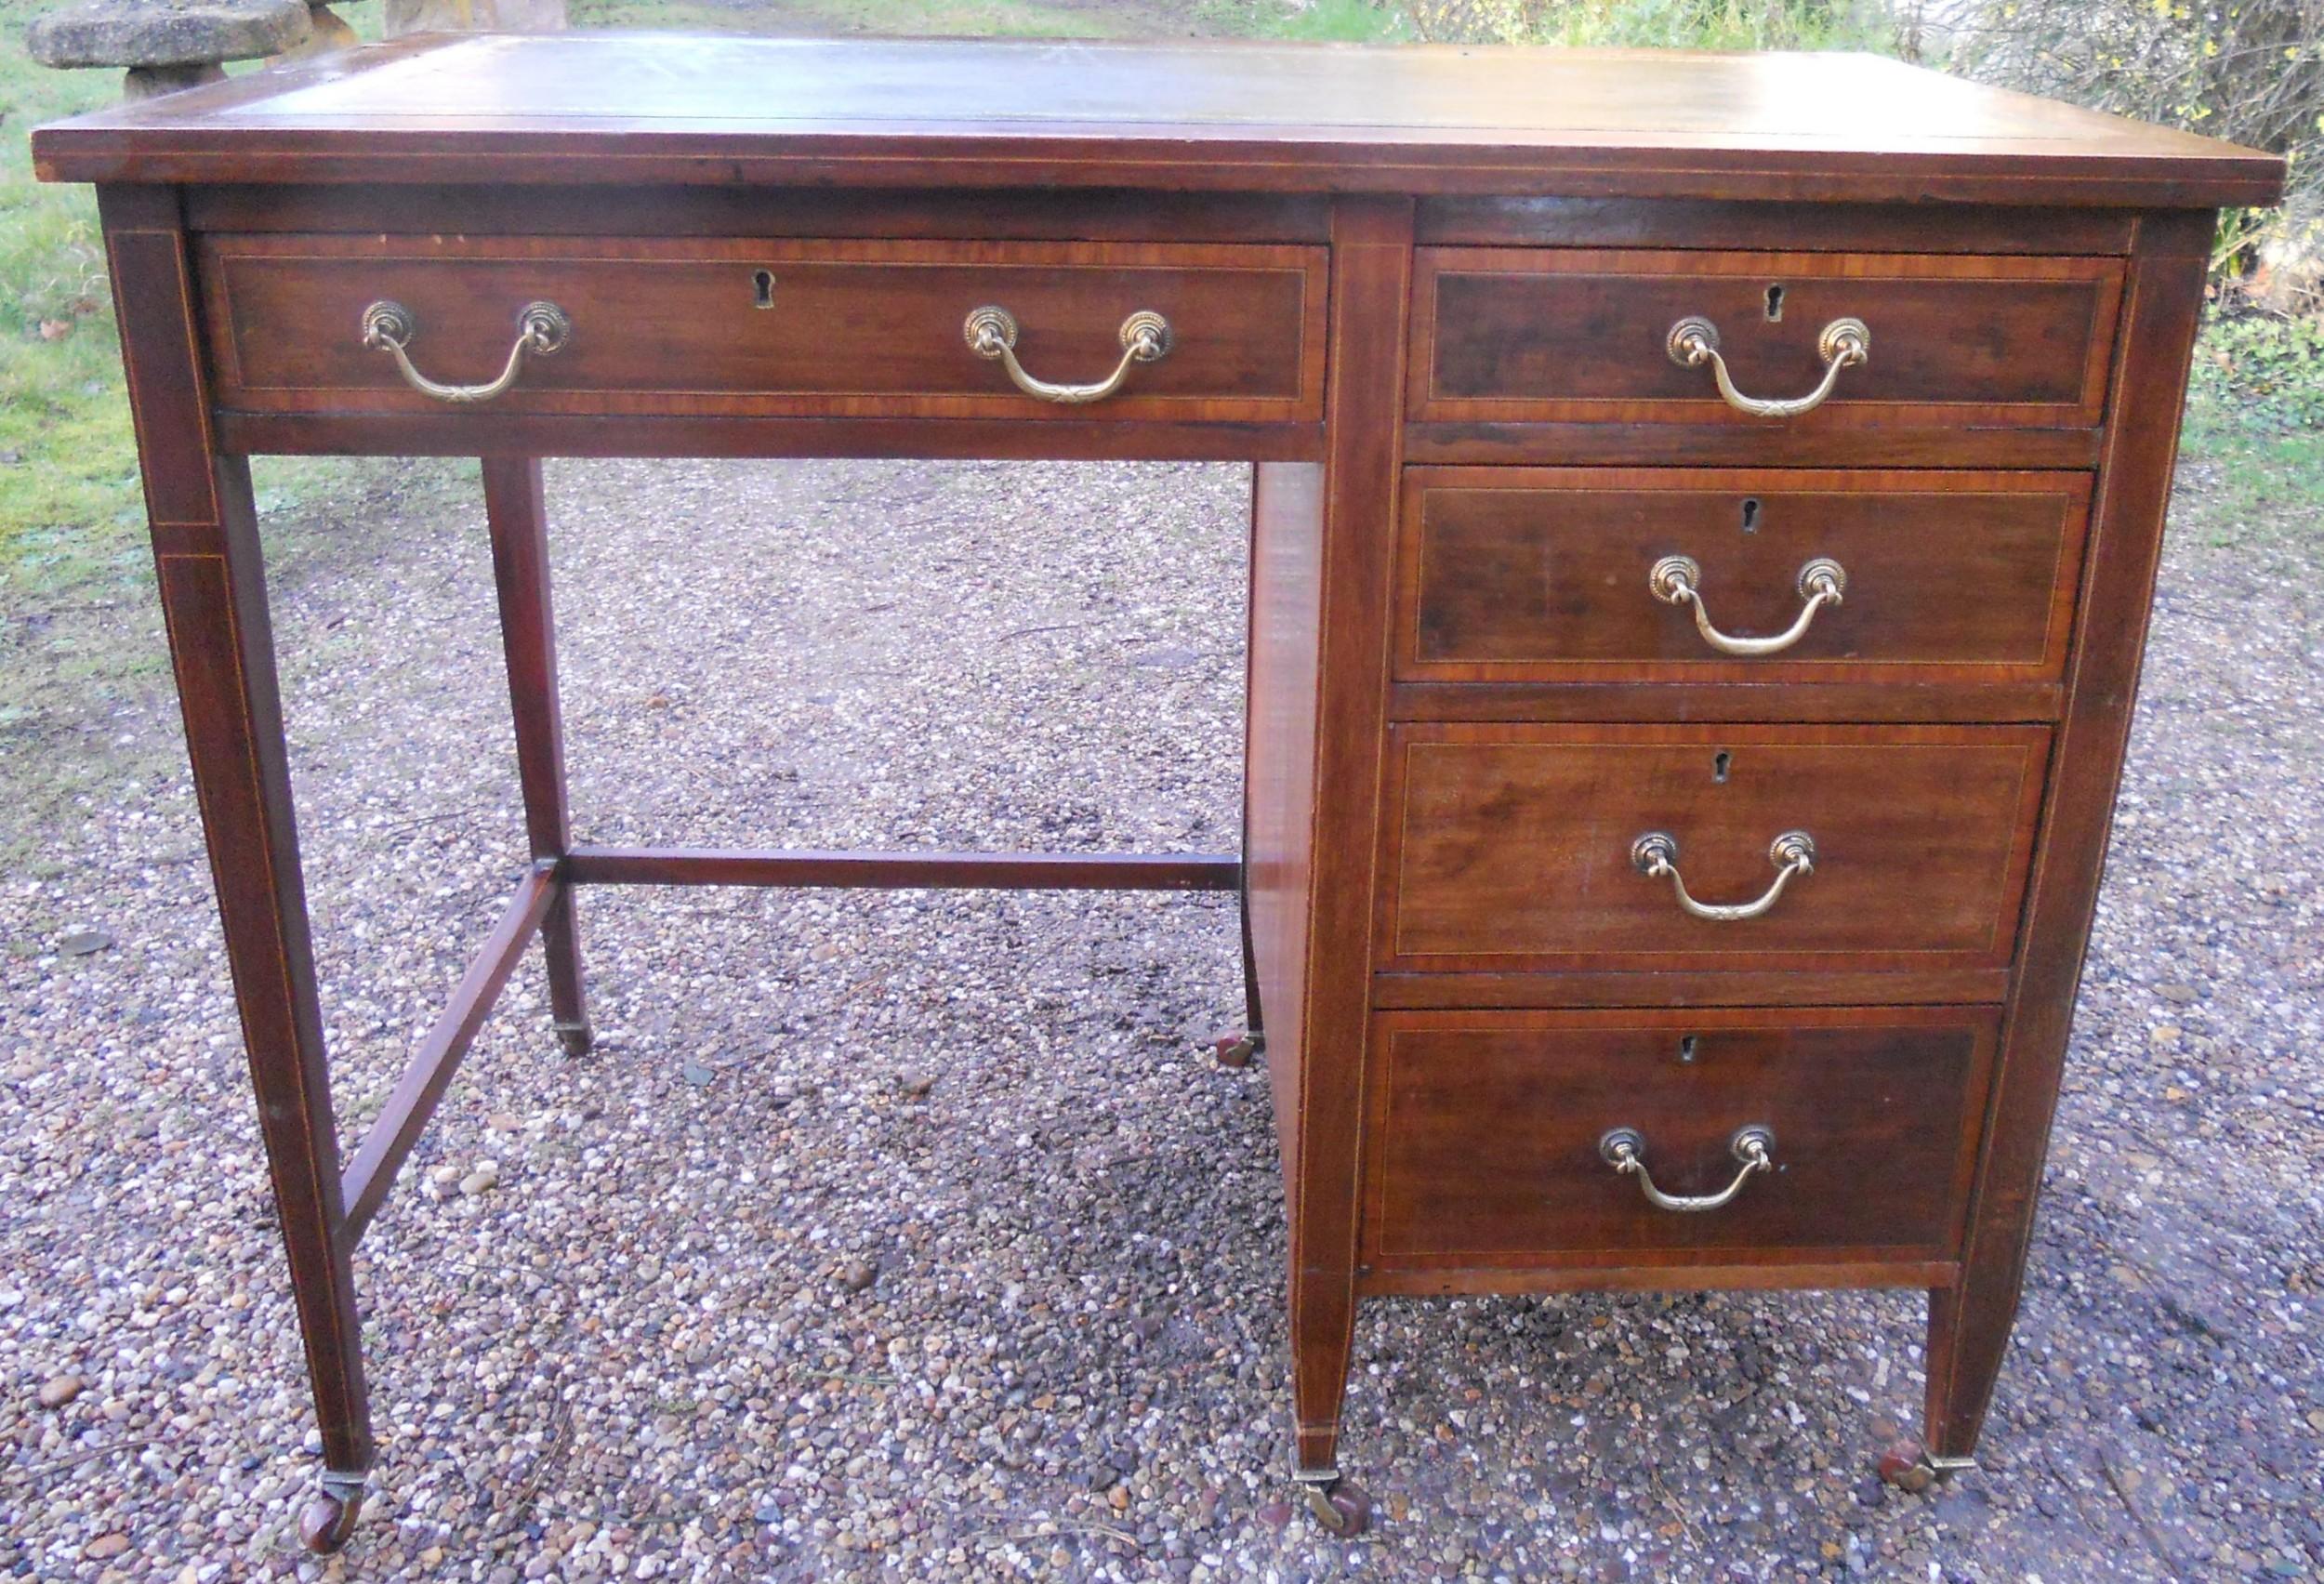 edwardian inlaid mahogany small writing desk